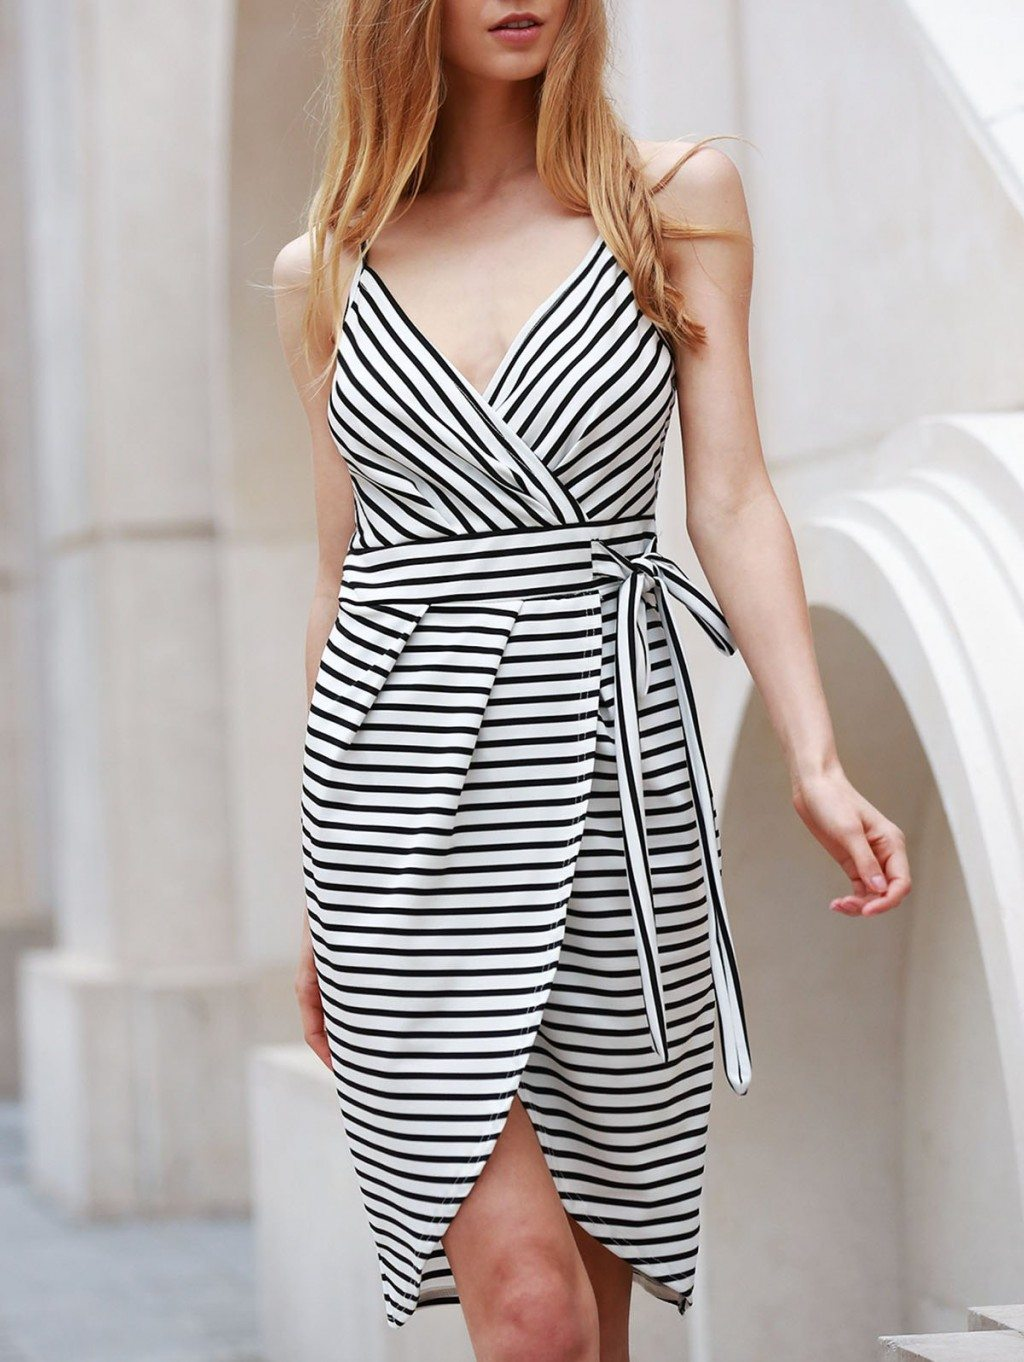 Sexy Sleeveless Spaghetti Strap Striped Dovetail Self-Tie Dress For Women